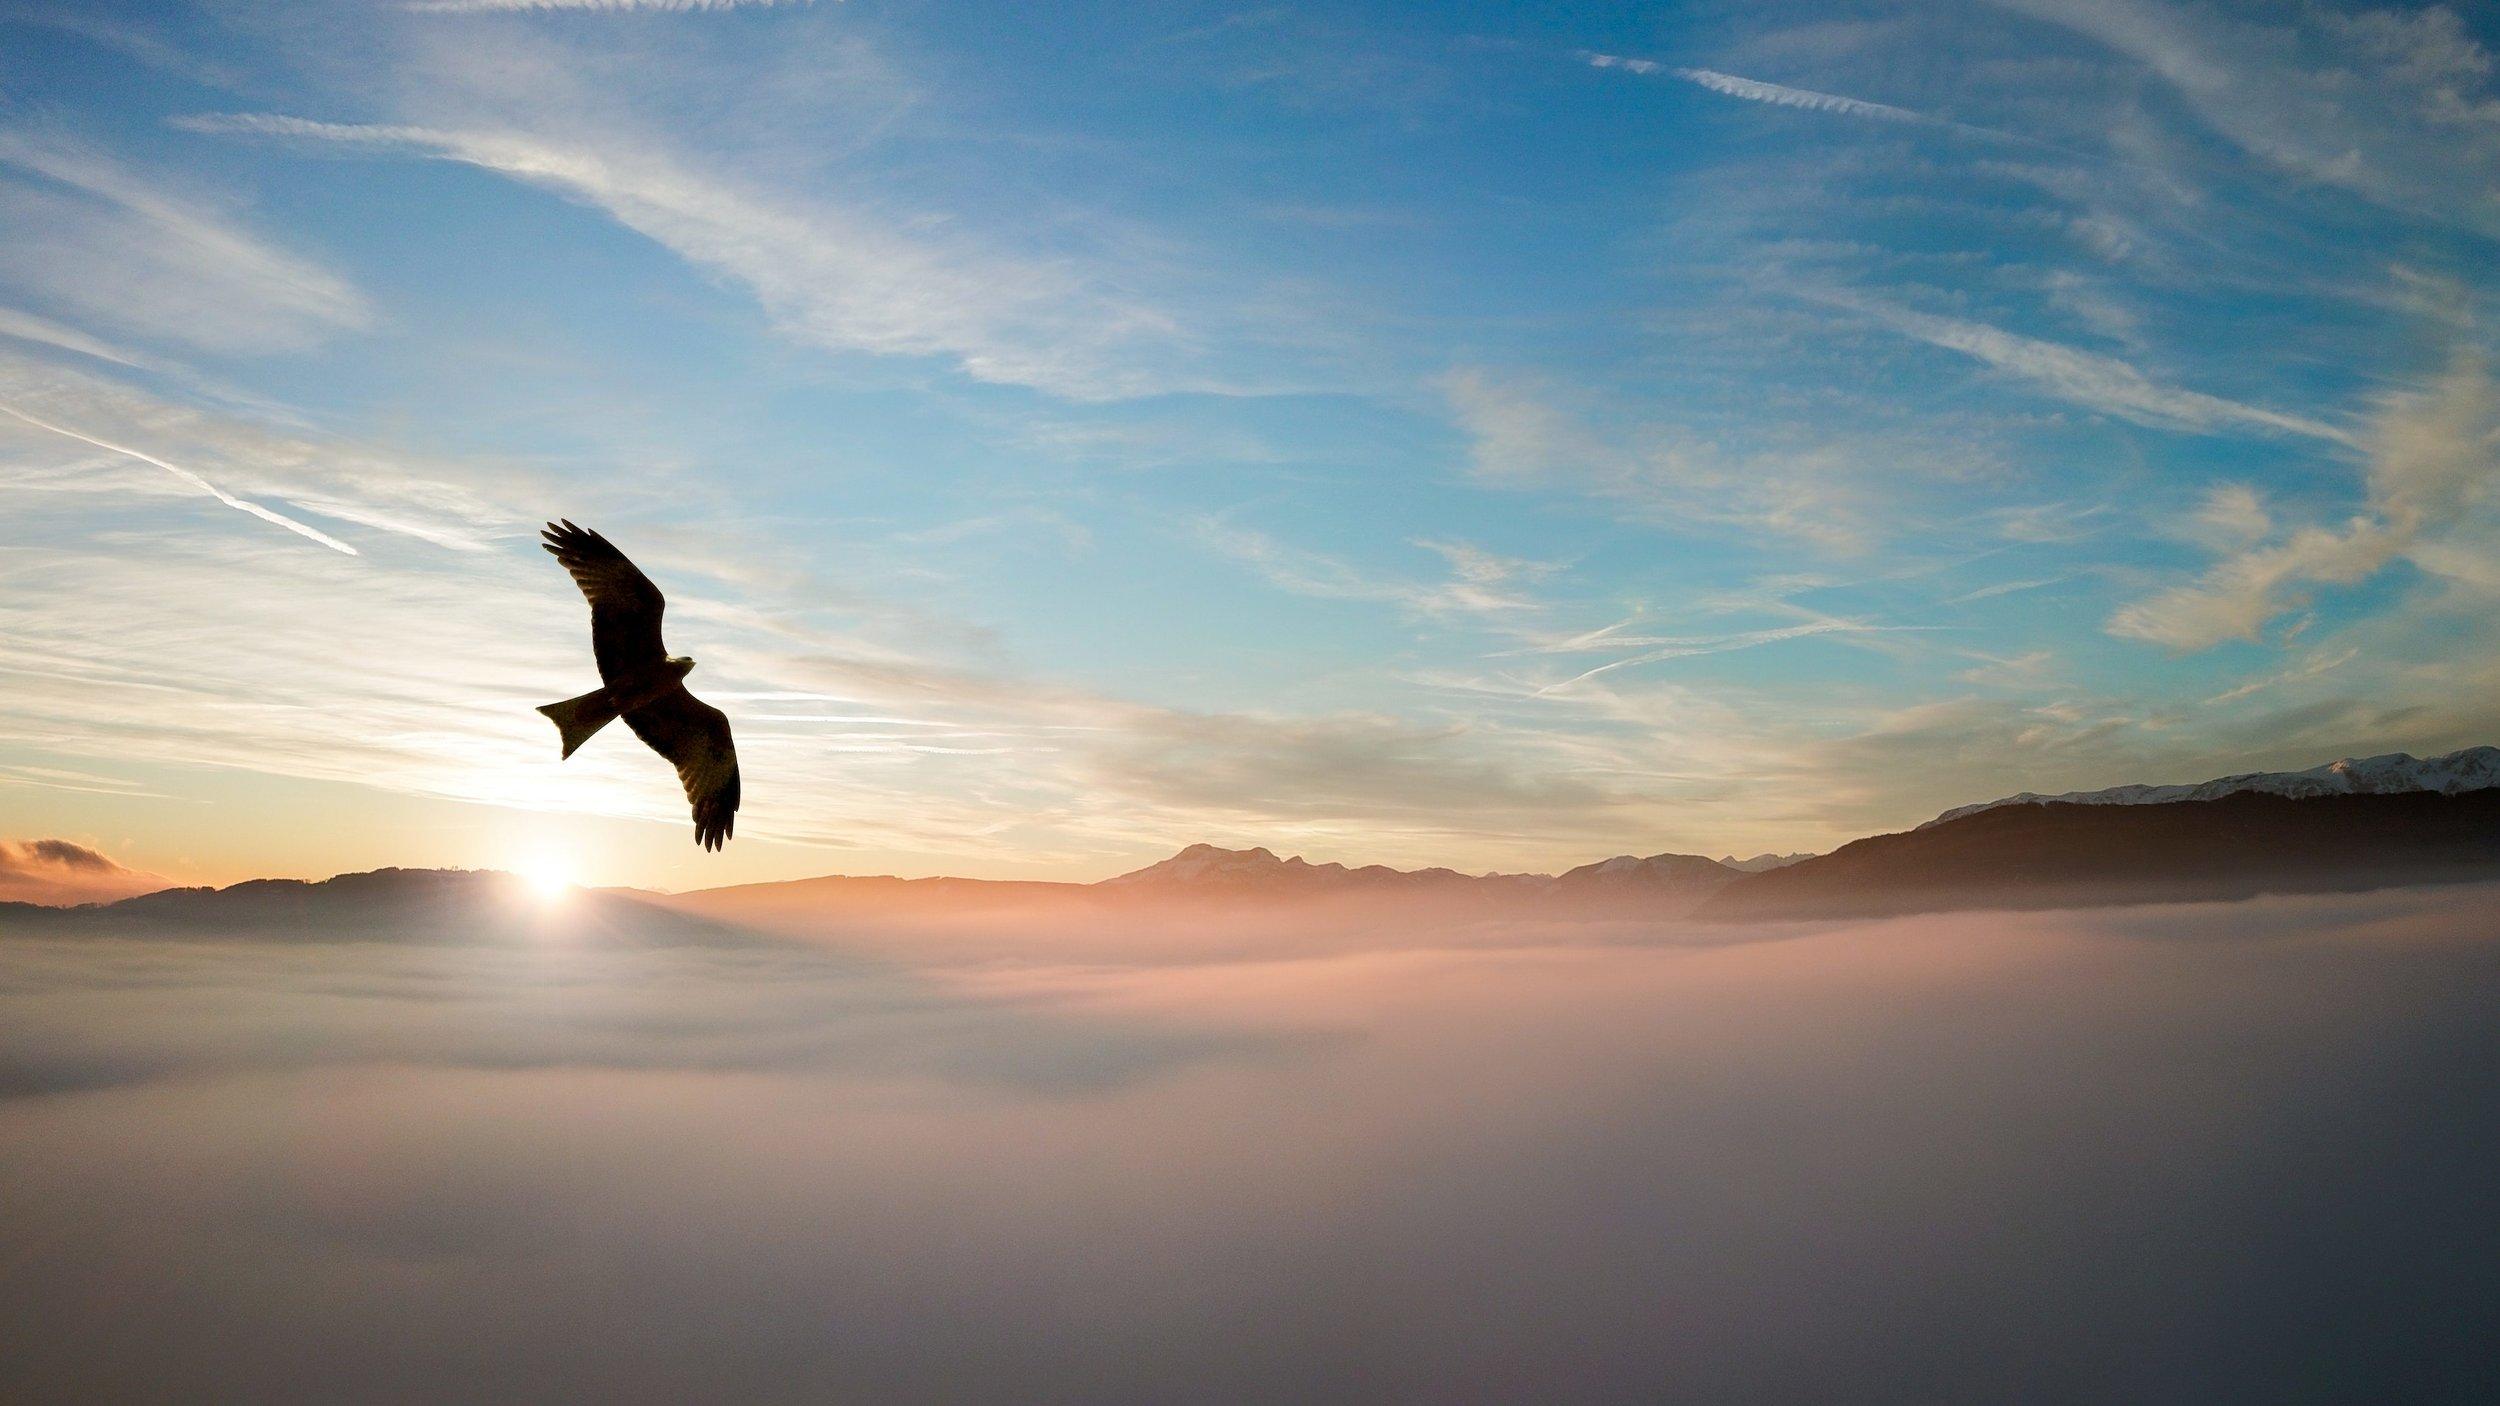 backlit-bird-clouds-755385.jpg